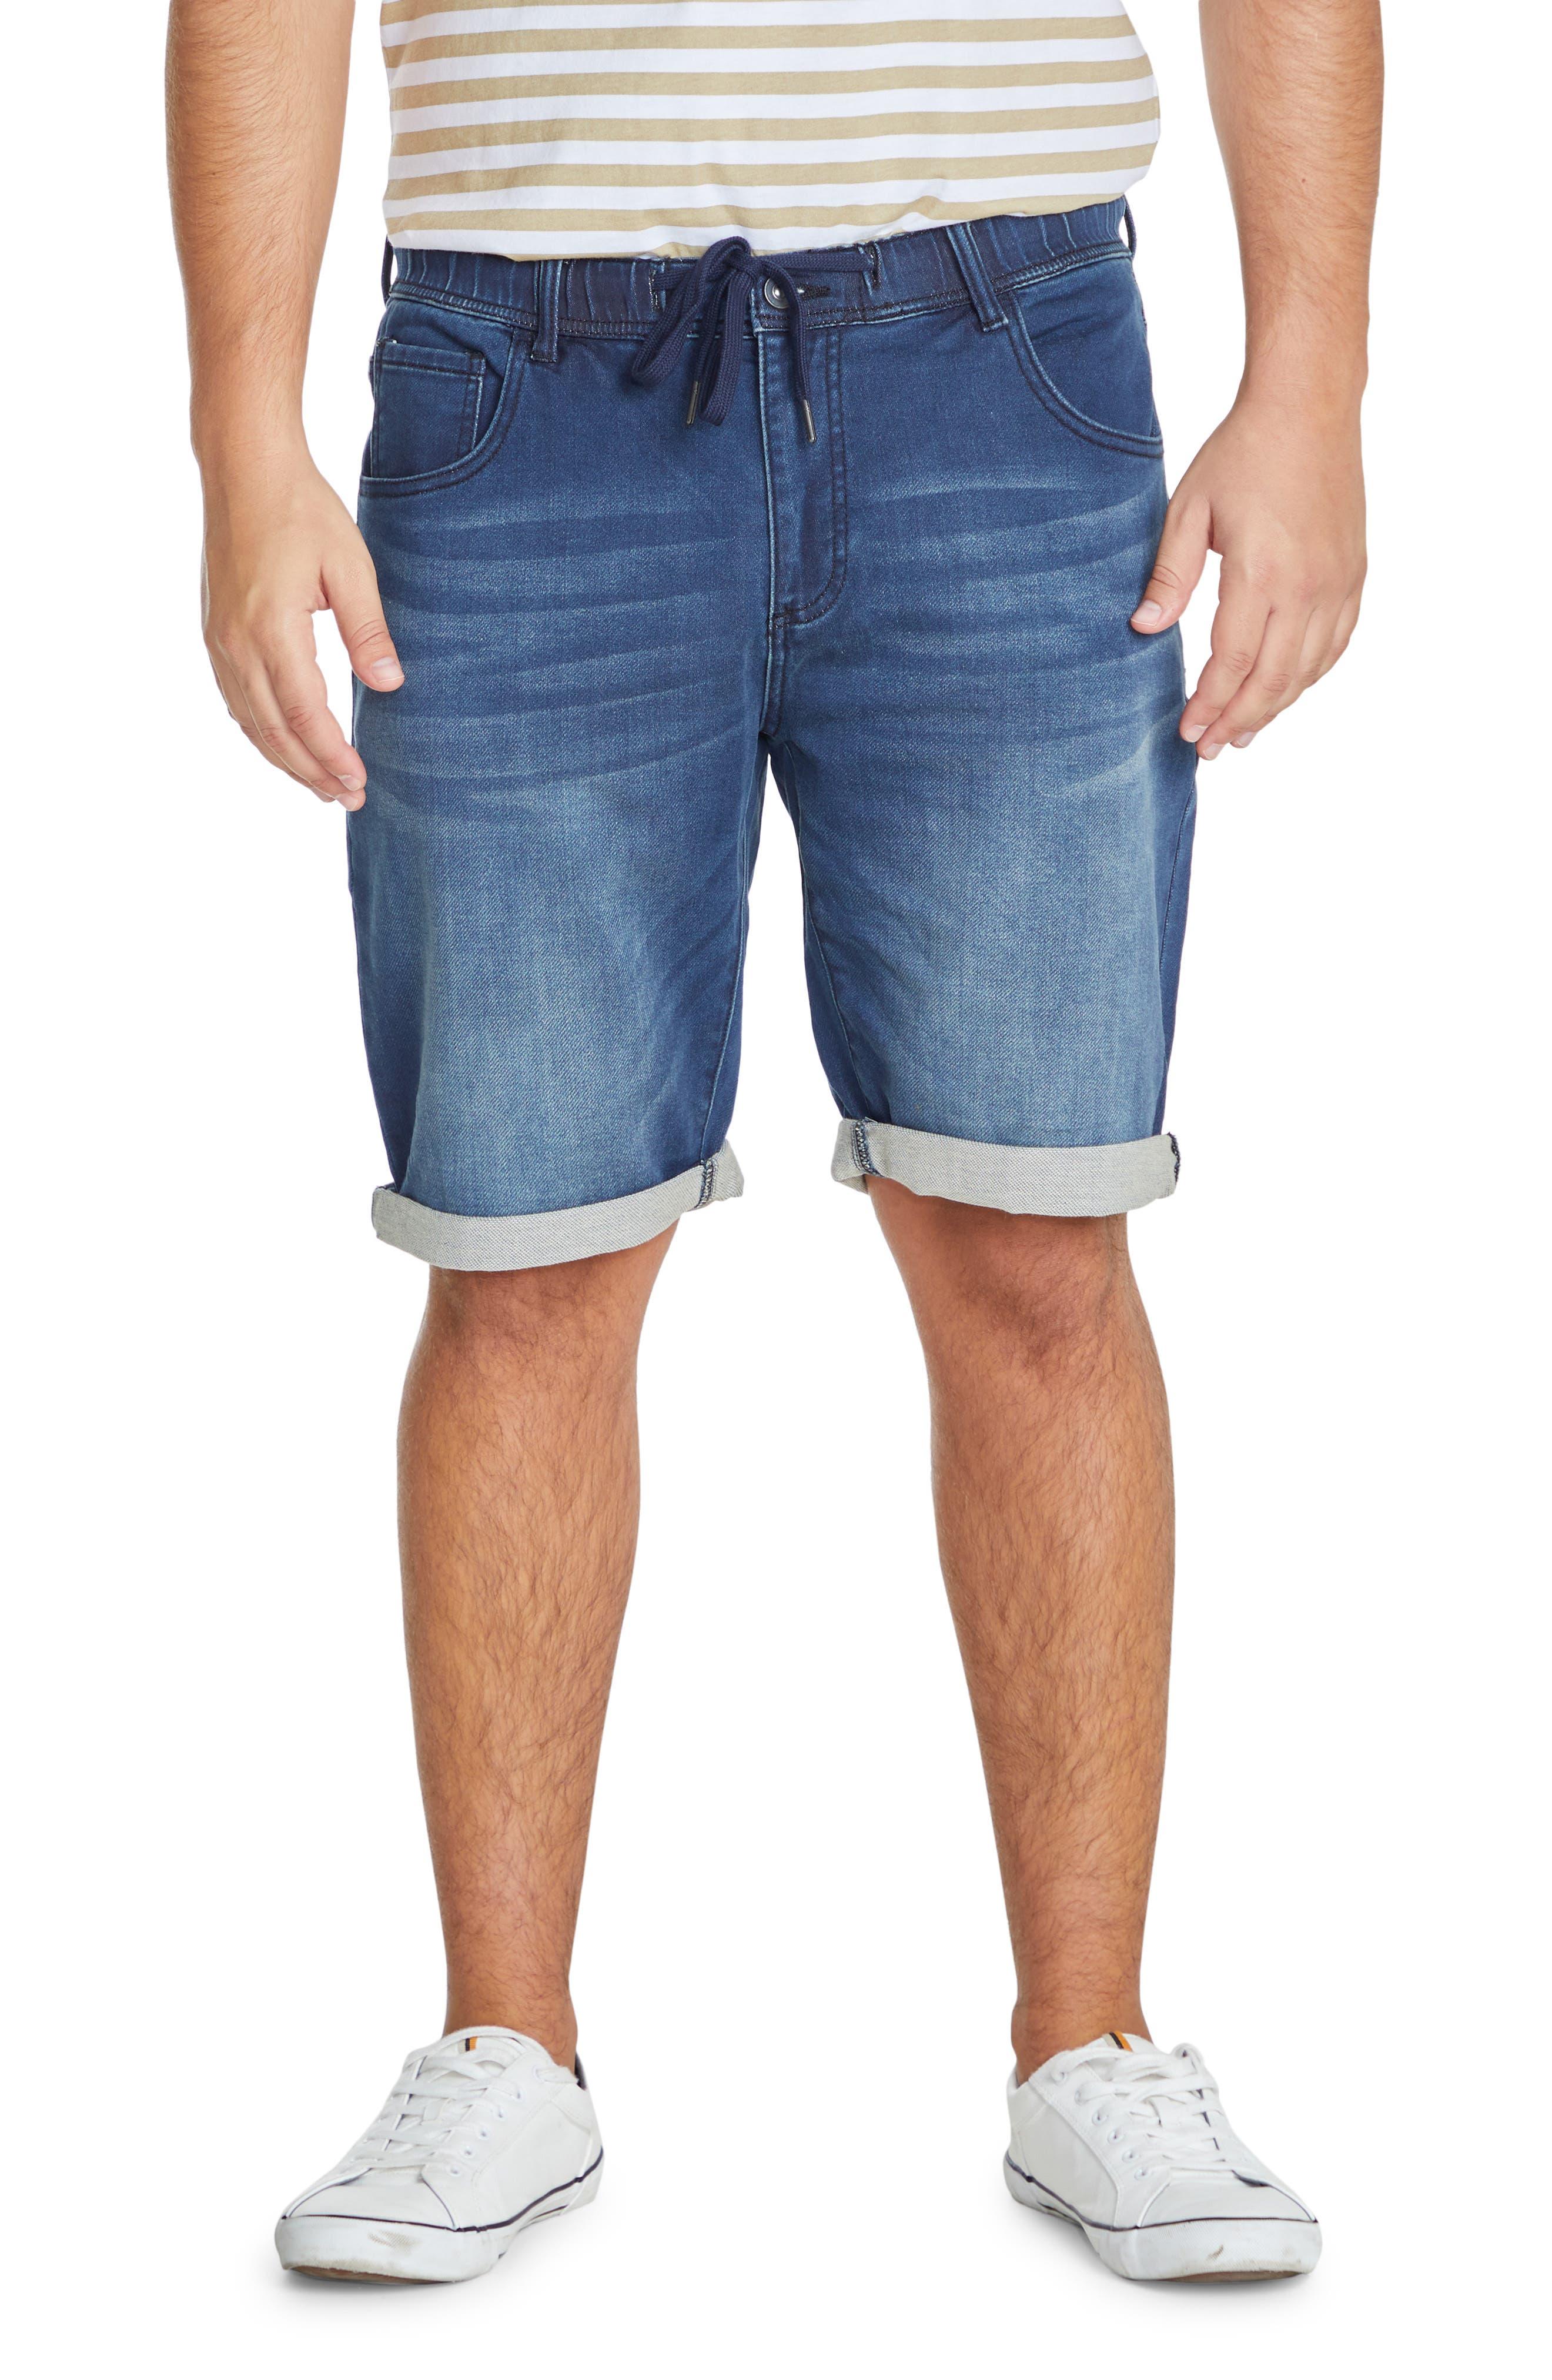 Deran Drawstring Denim Shorts